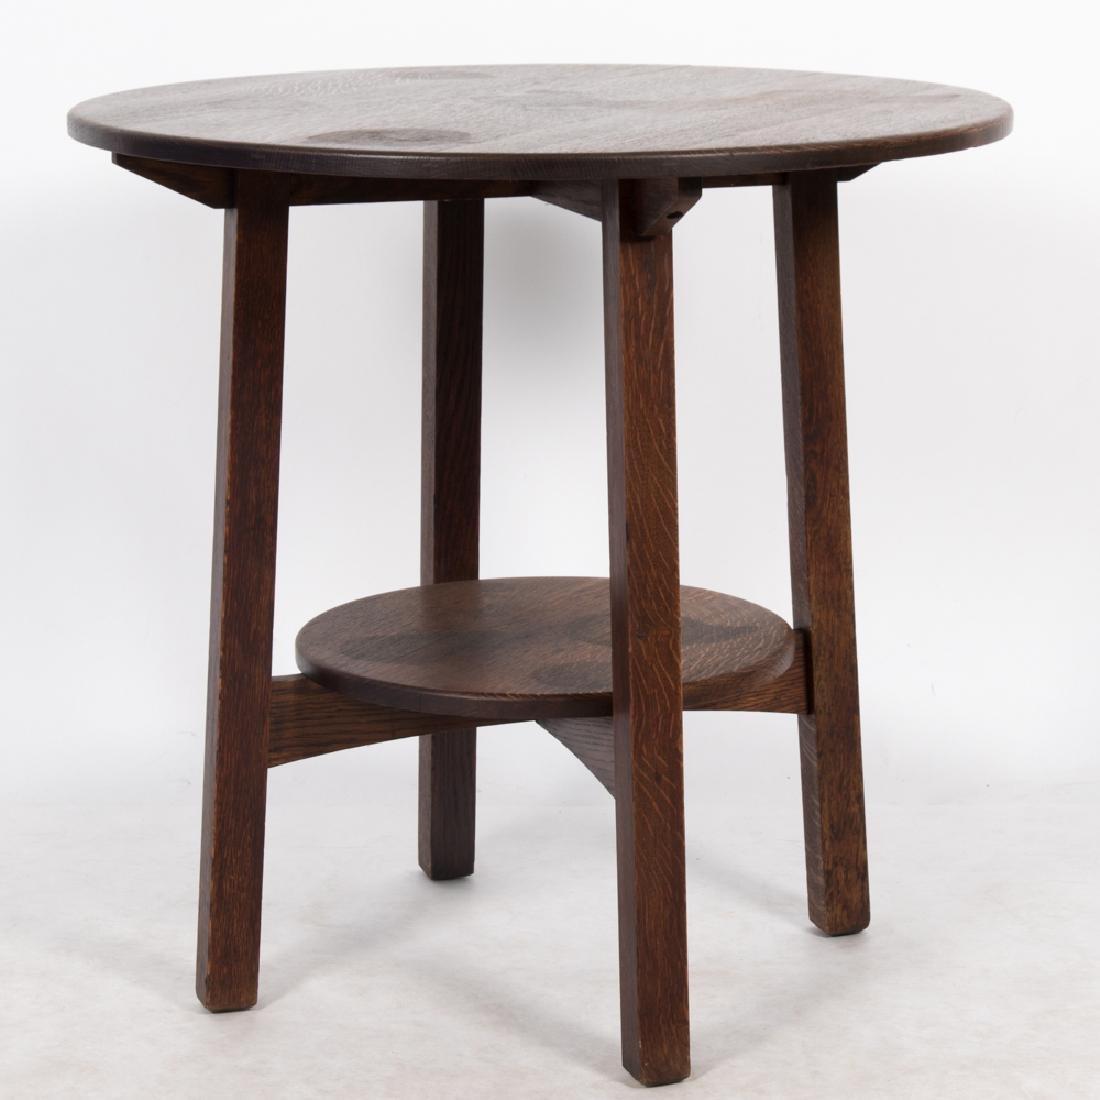 A Limbert Oak Lamp Table, 20th Century,